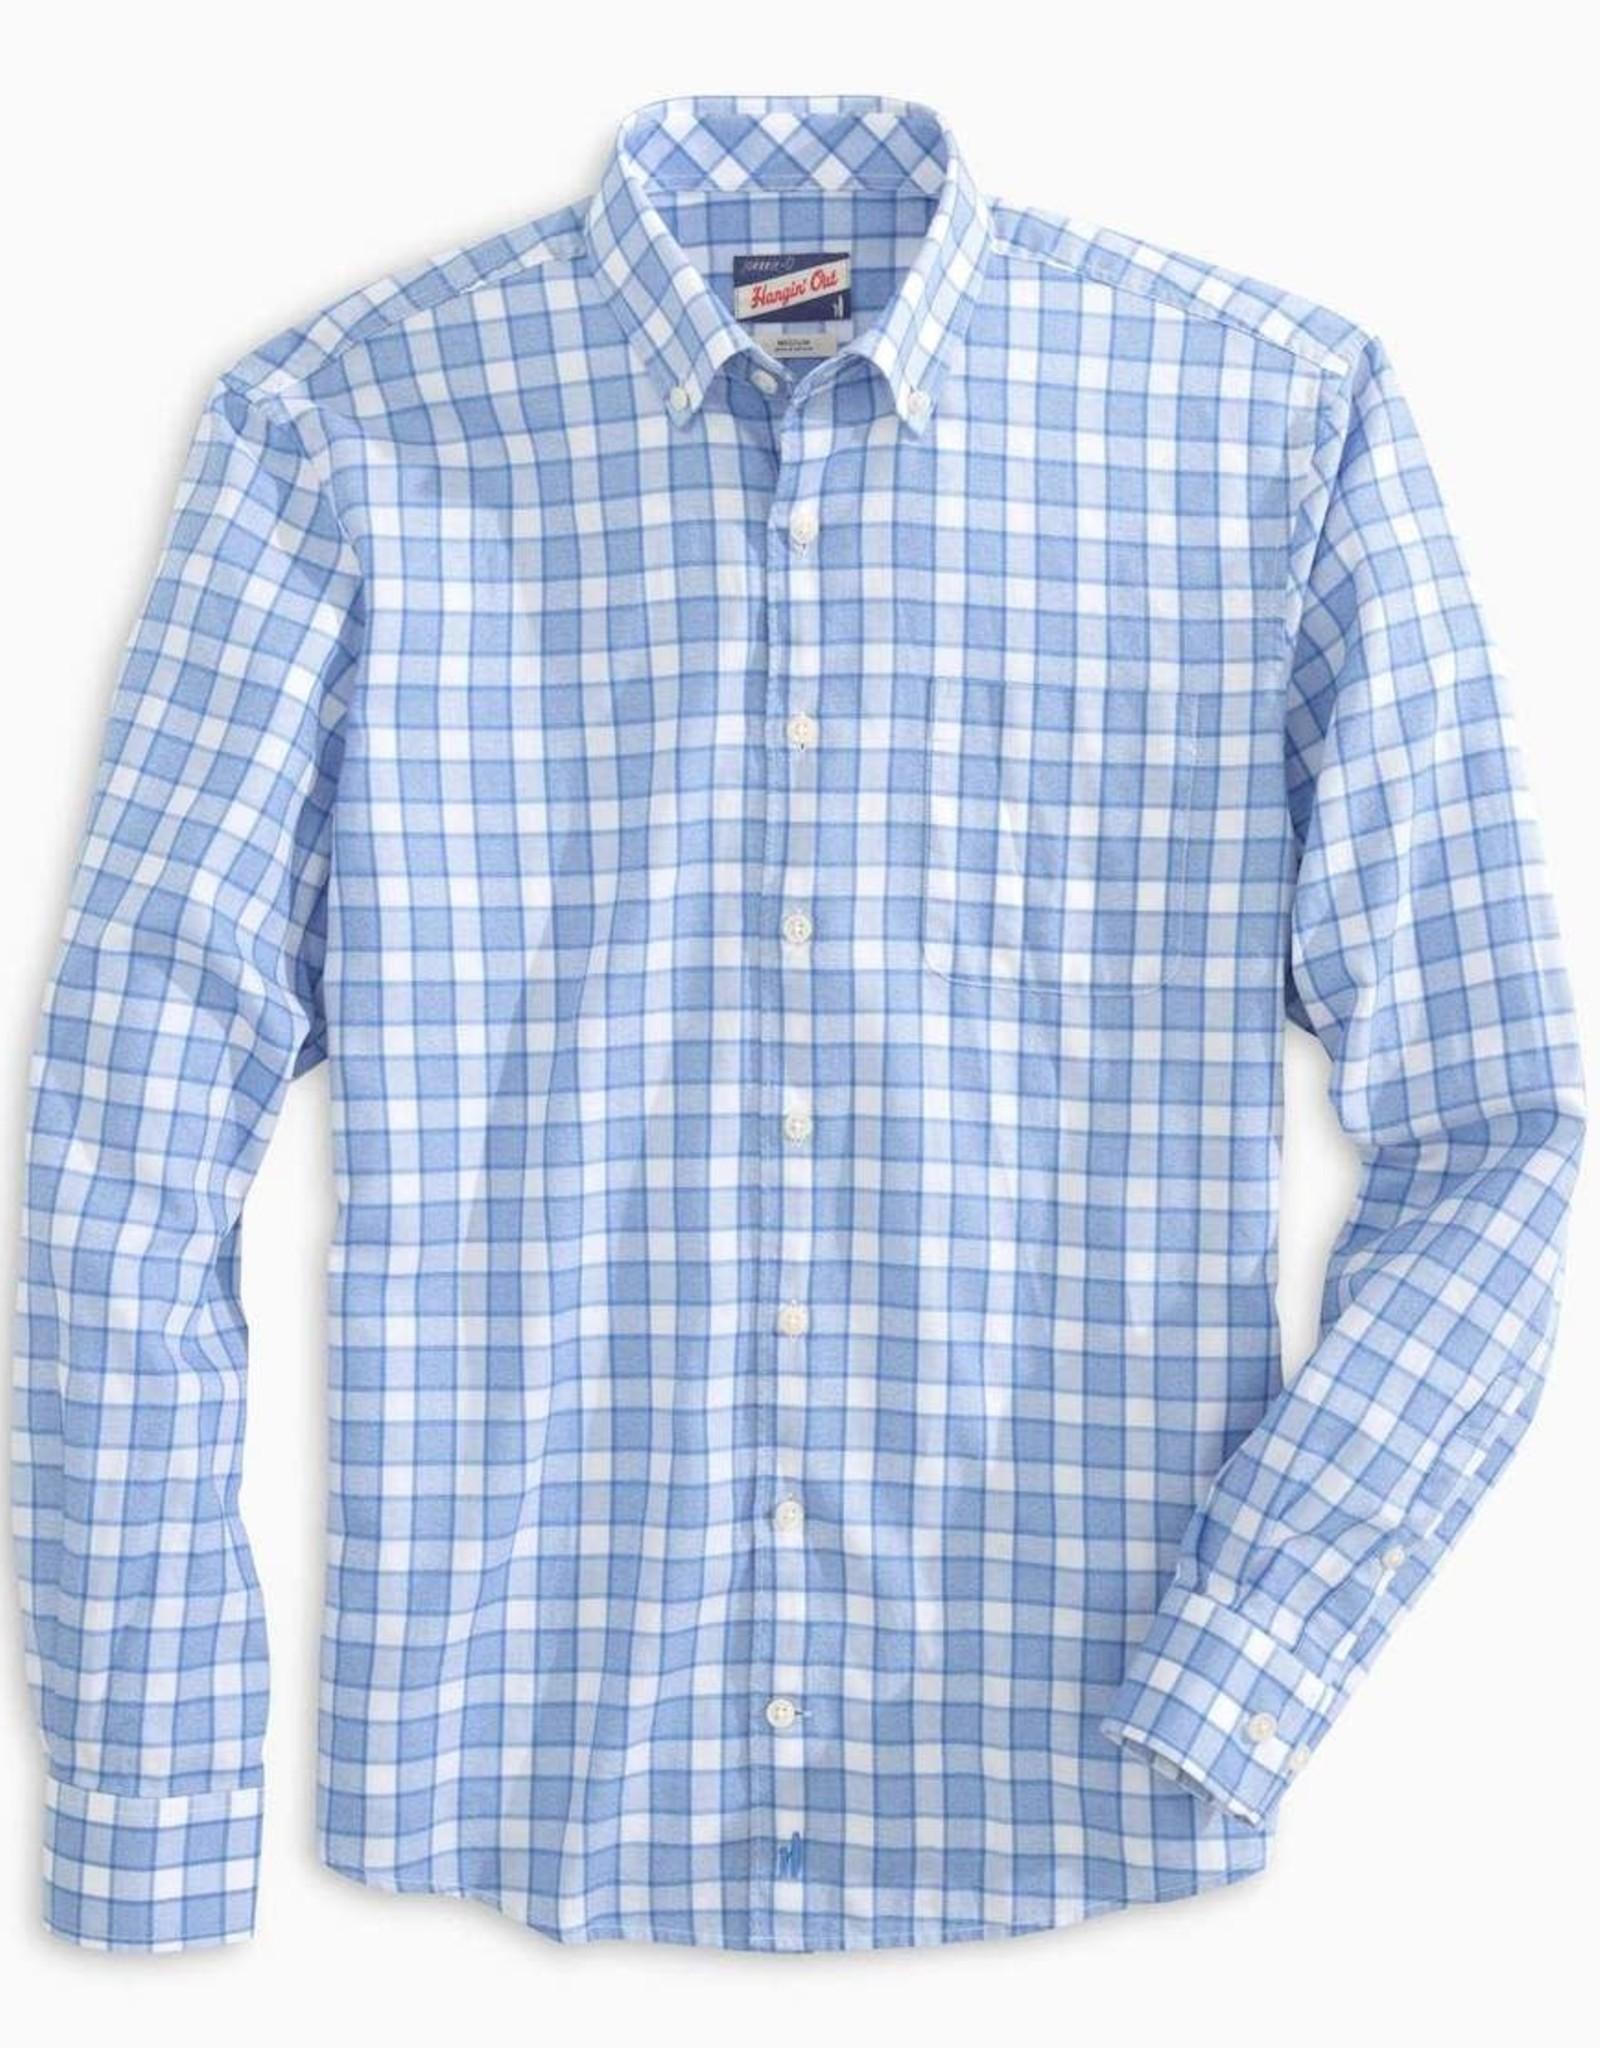 Johnnie-O Shelley Shirt